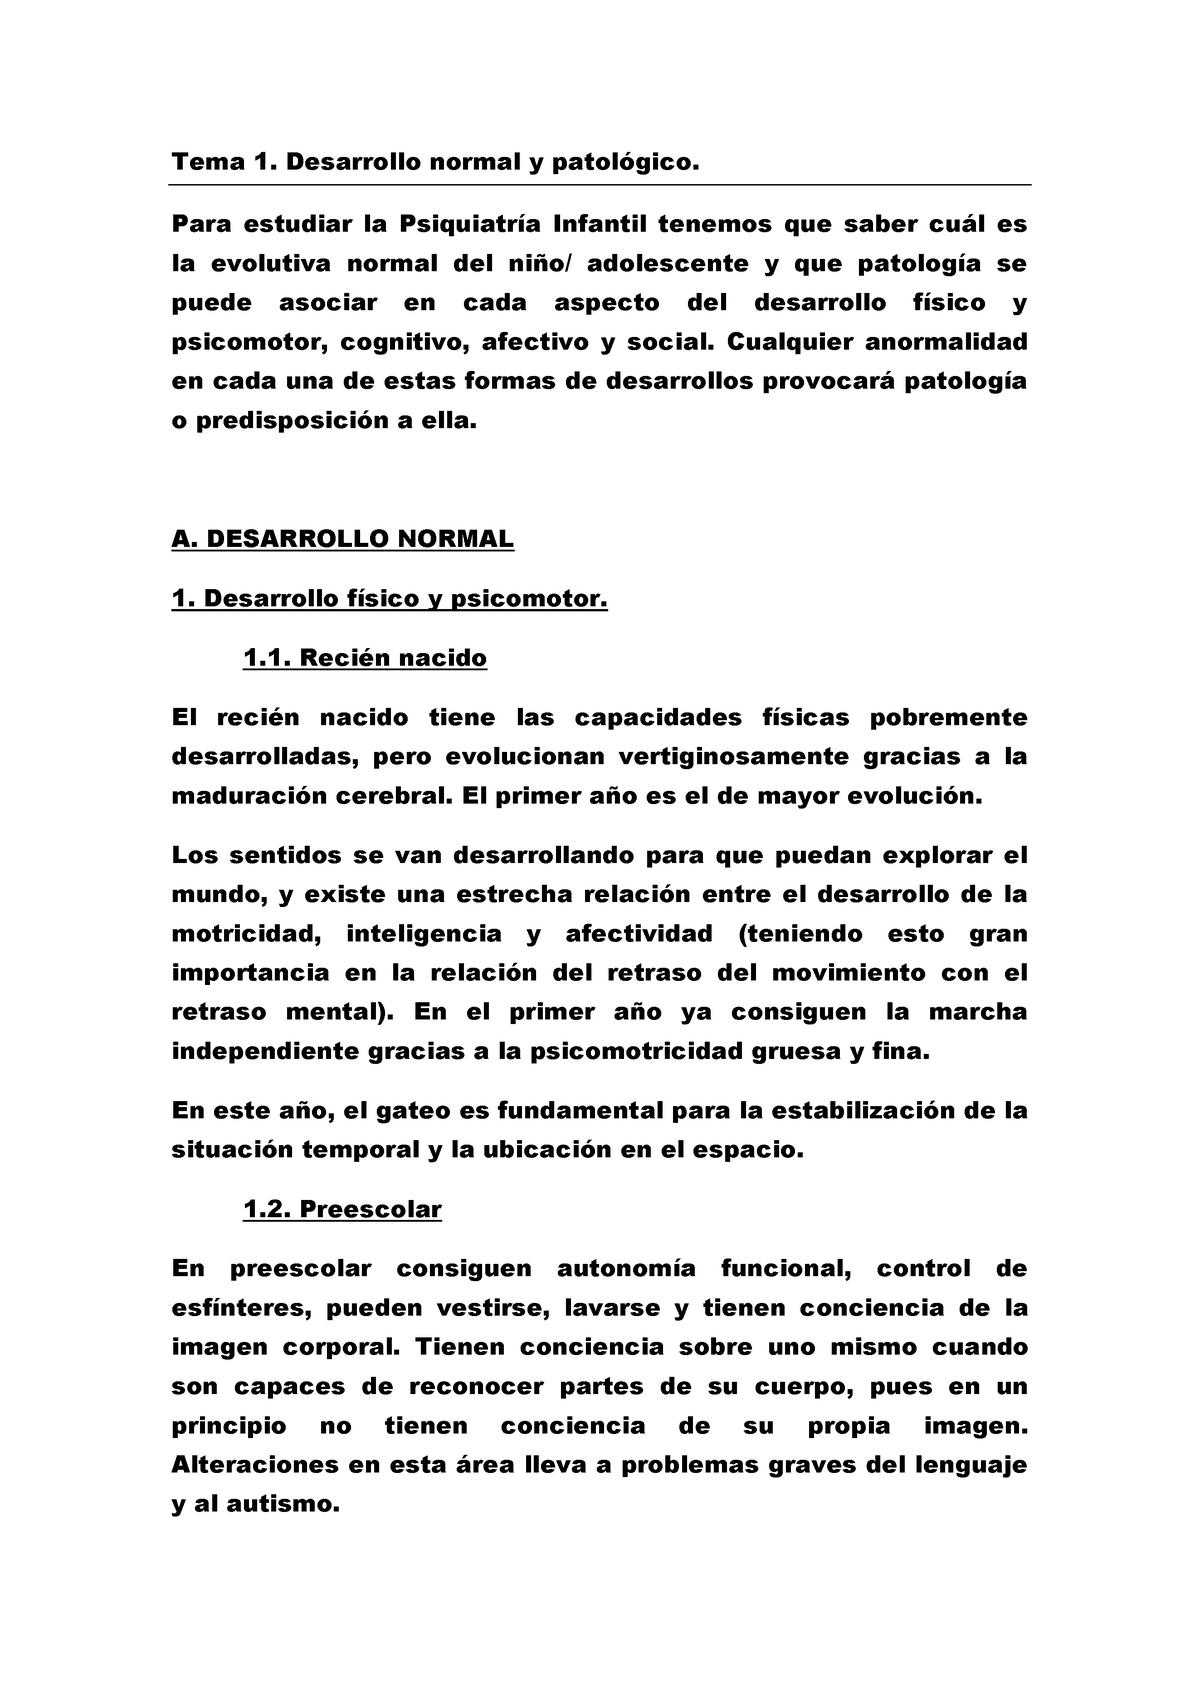 857325a63ce4 Psiquiatría Temario - 1720036: Psiquiatría - StuDocu